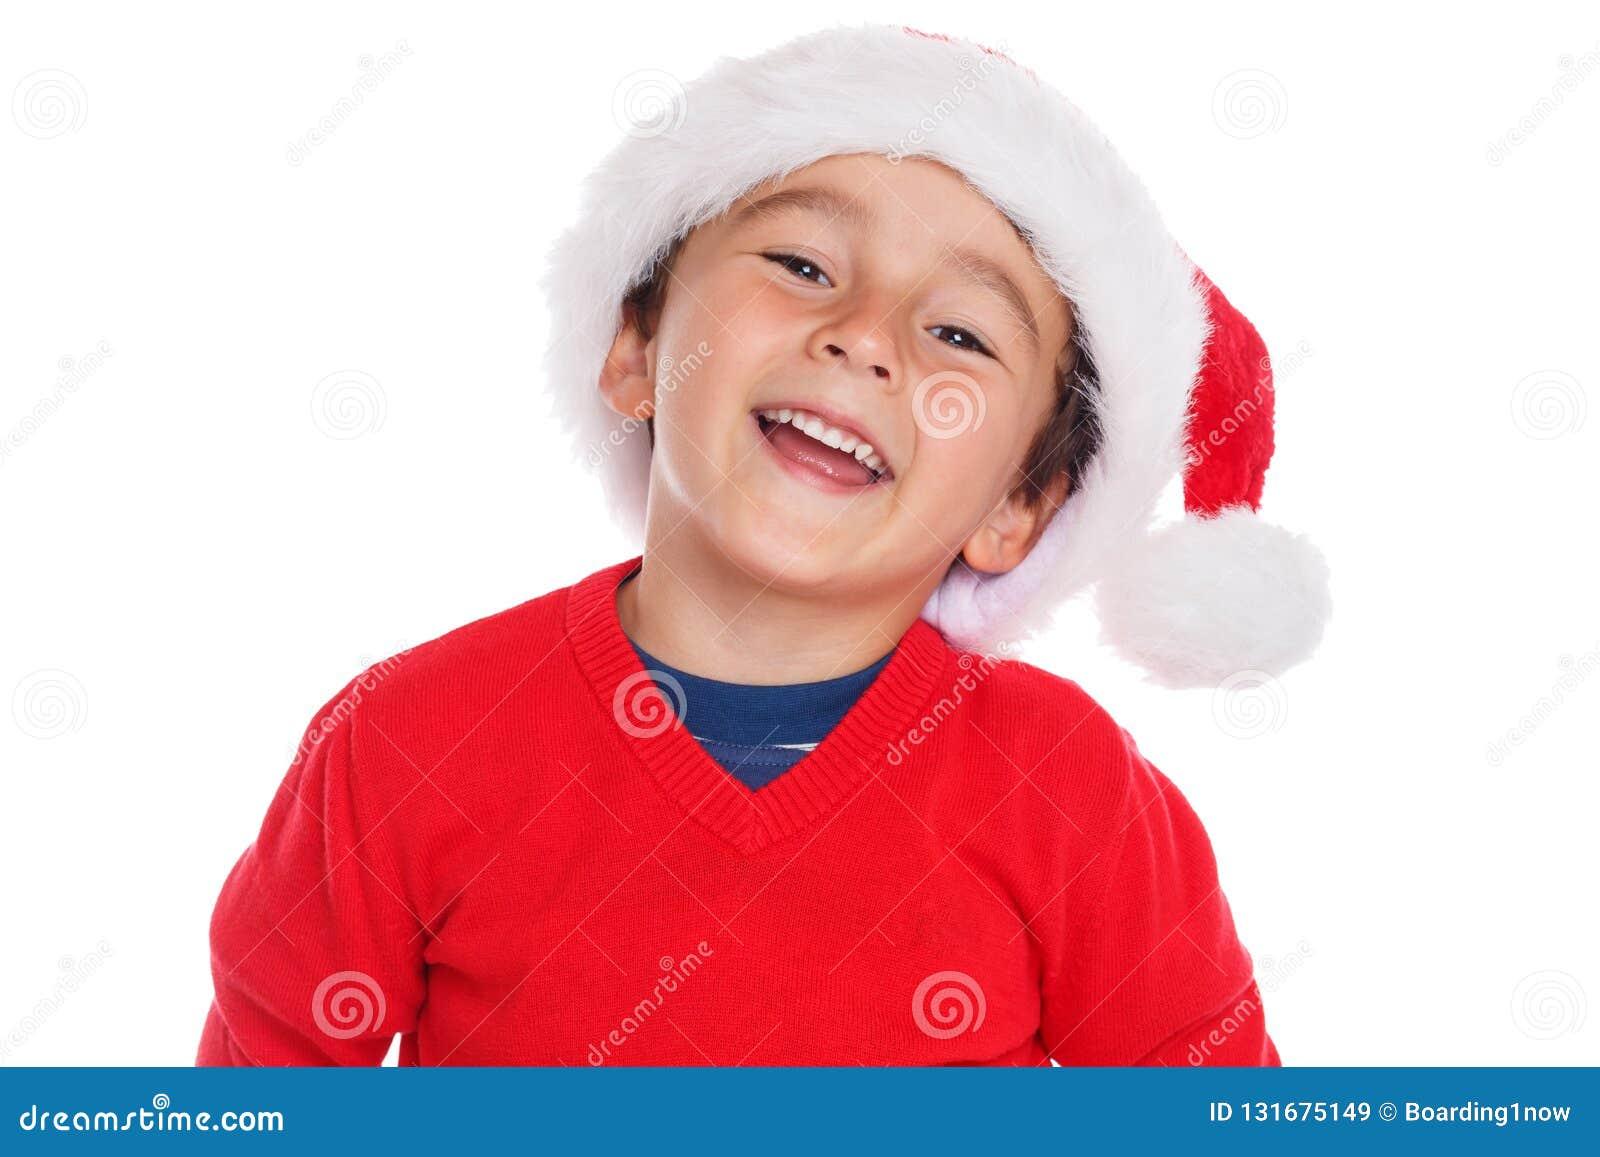 Child kid boy Christmas Santa Claus smiling happy isolated on white background